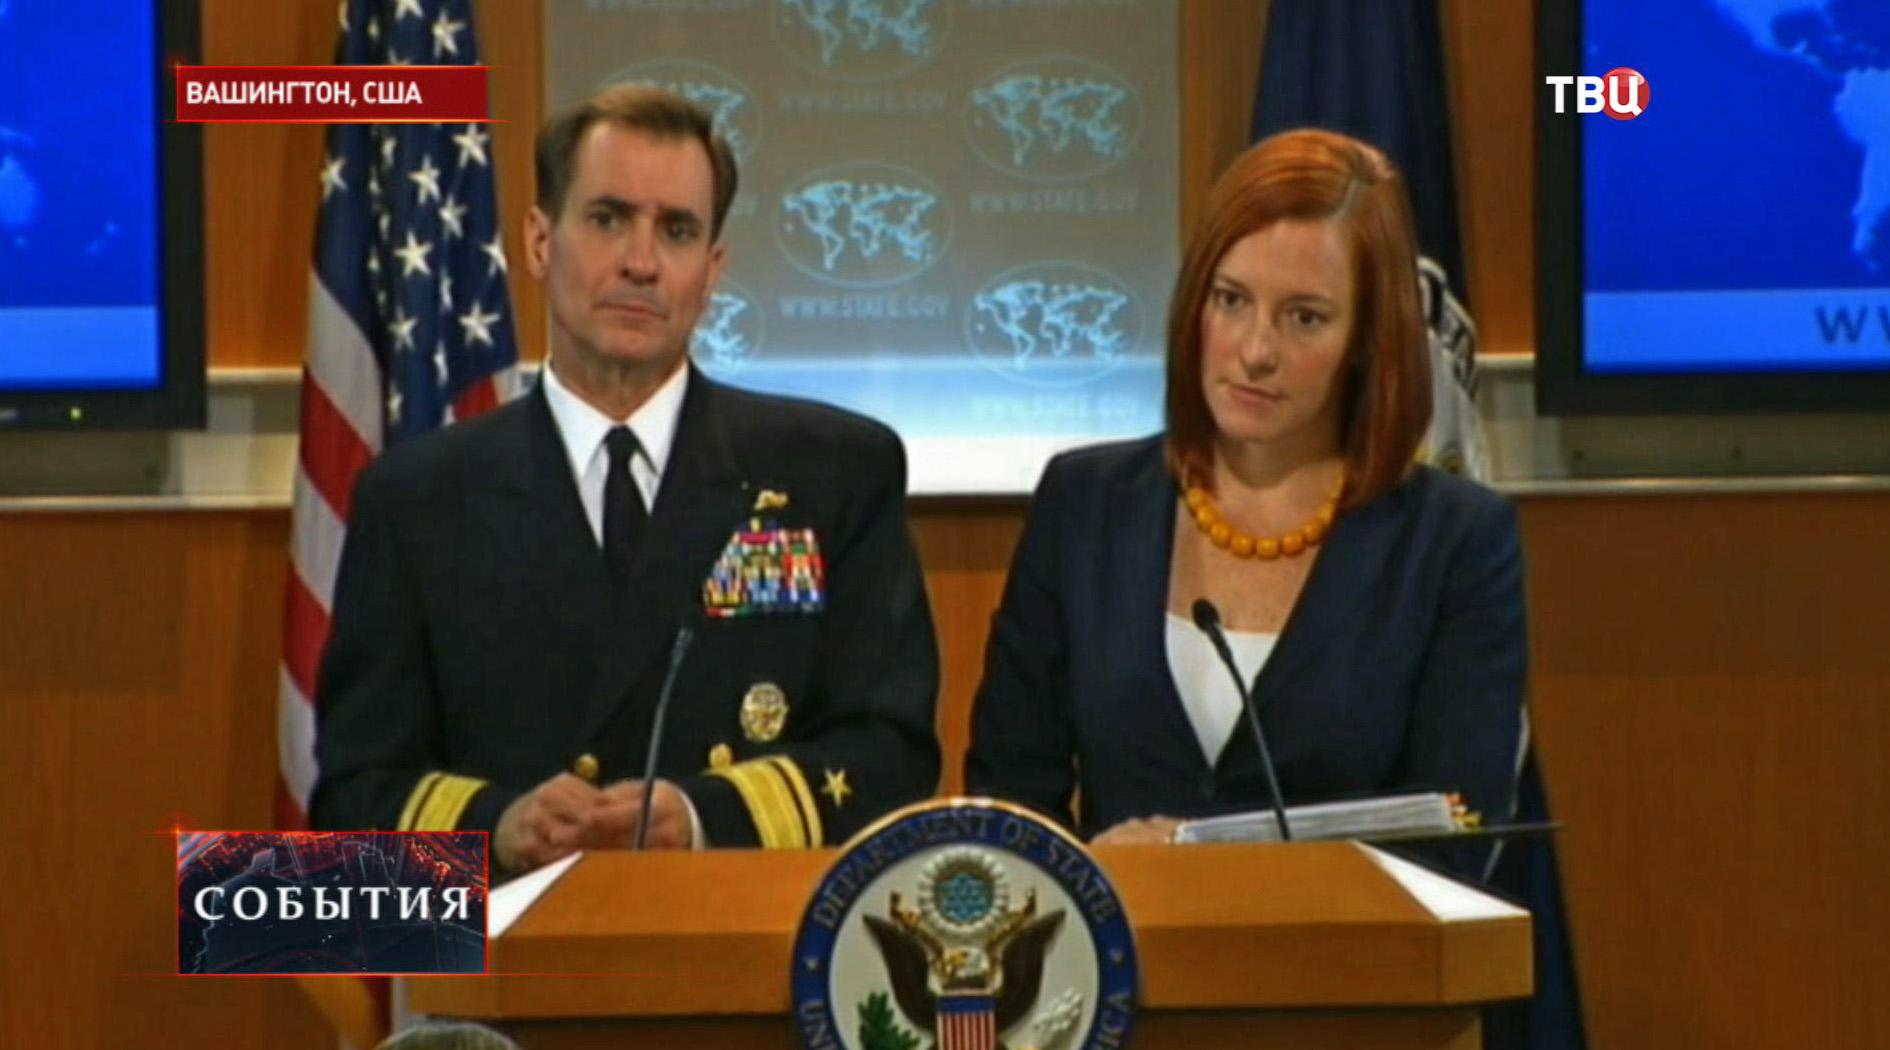 Пресс-секретарь Пентагона Джон Кирби и представитель госдепартамента США Джен Псаки